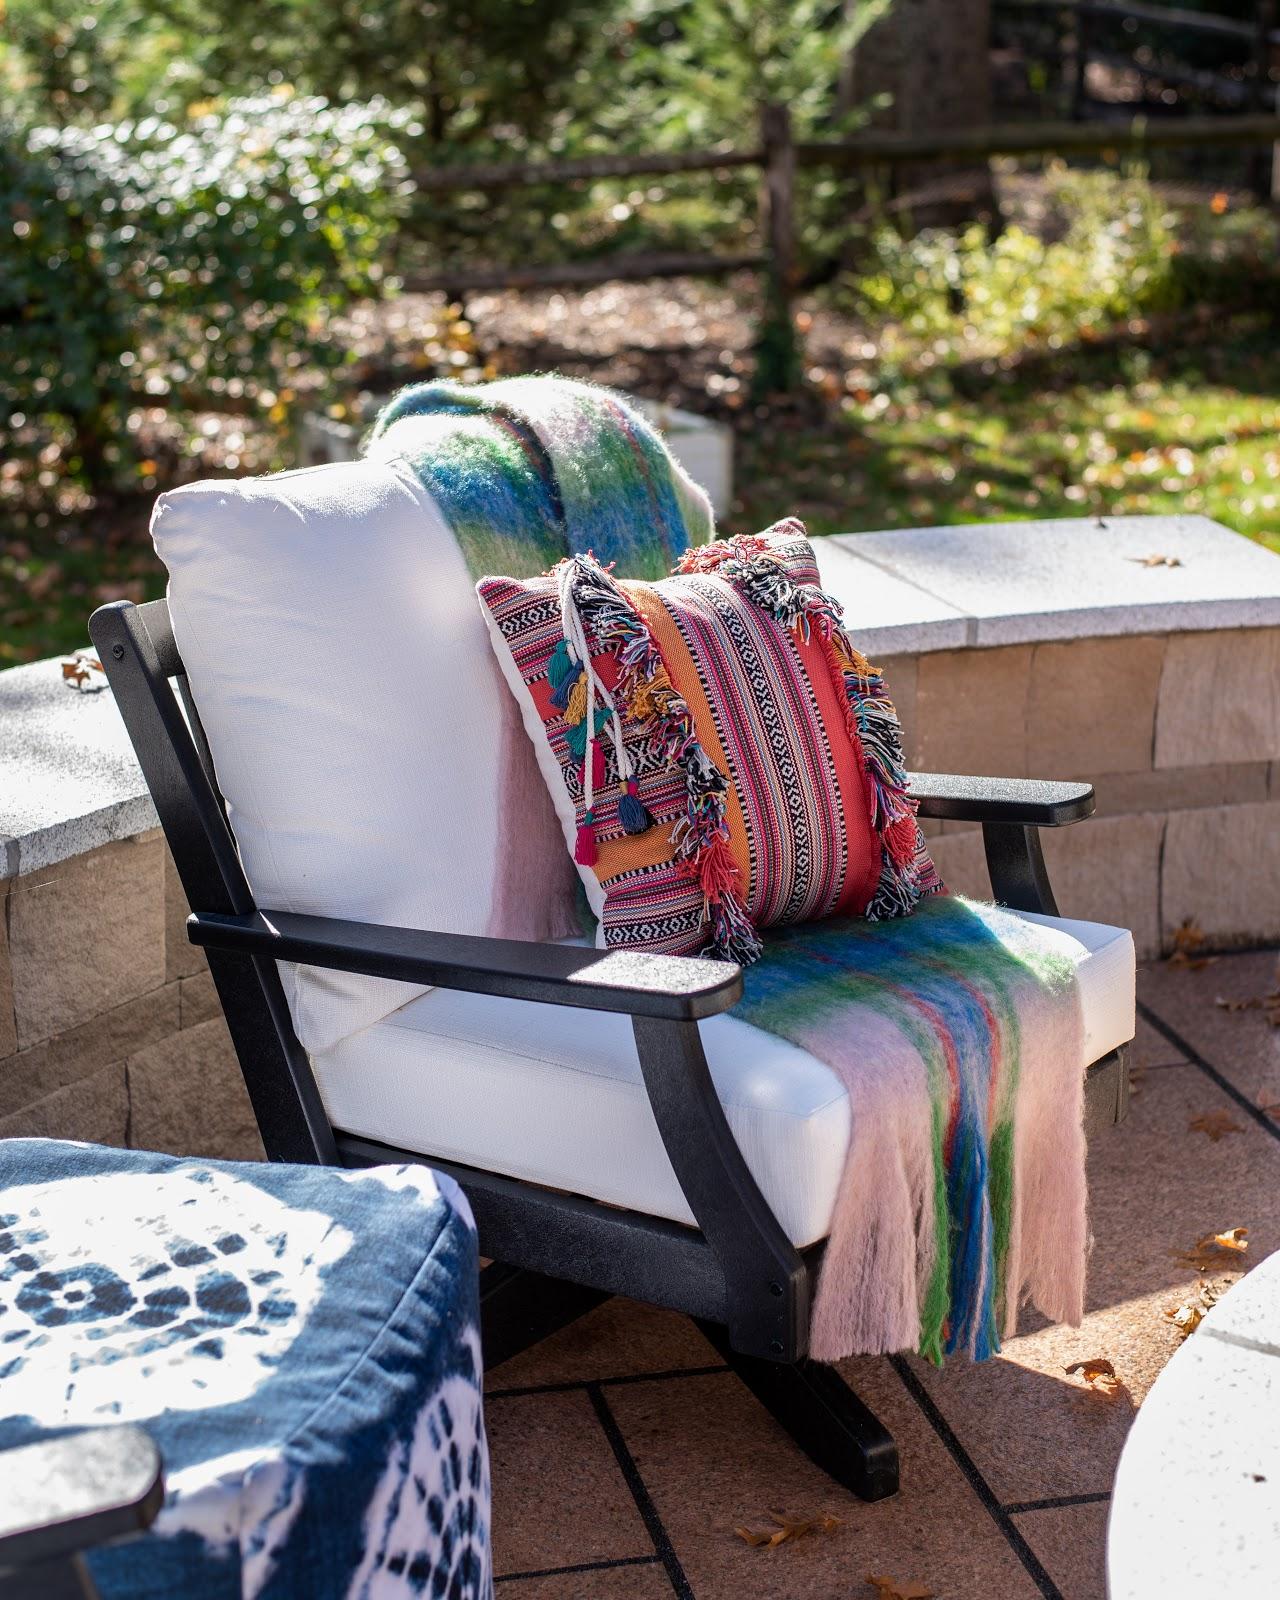 CAROLINA CORAL™granite patio pavers, Polywood chair and SmithHonig pillows outdoors